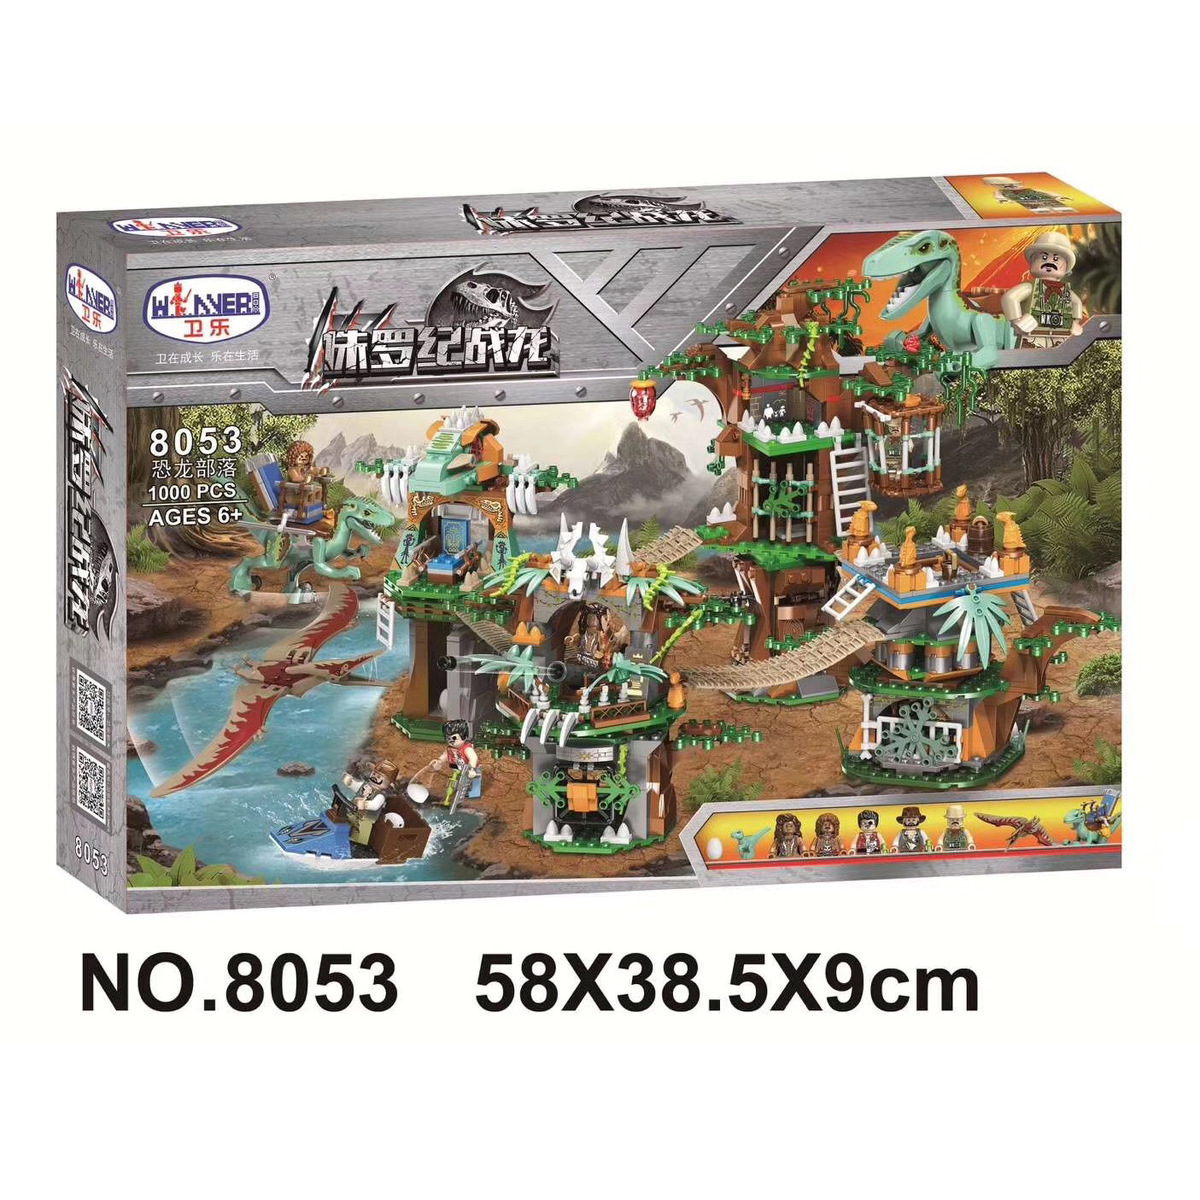 WM 8053 1000pcs Capture The Dinosaurs Of Jurassic World Building Blocks Educational Toys Kids Compatible With Legos WM 8053 1000pcs Capture The Dinosaurs Of Jurassic World Building Blocks Educational Toys Kids Compatible With Legos